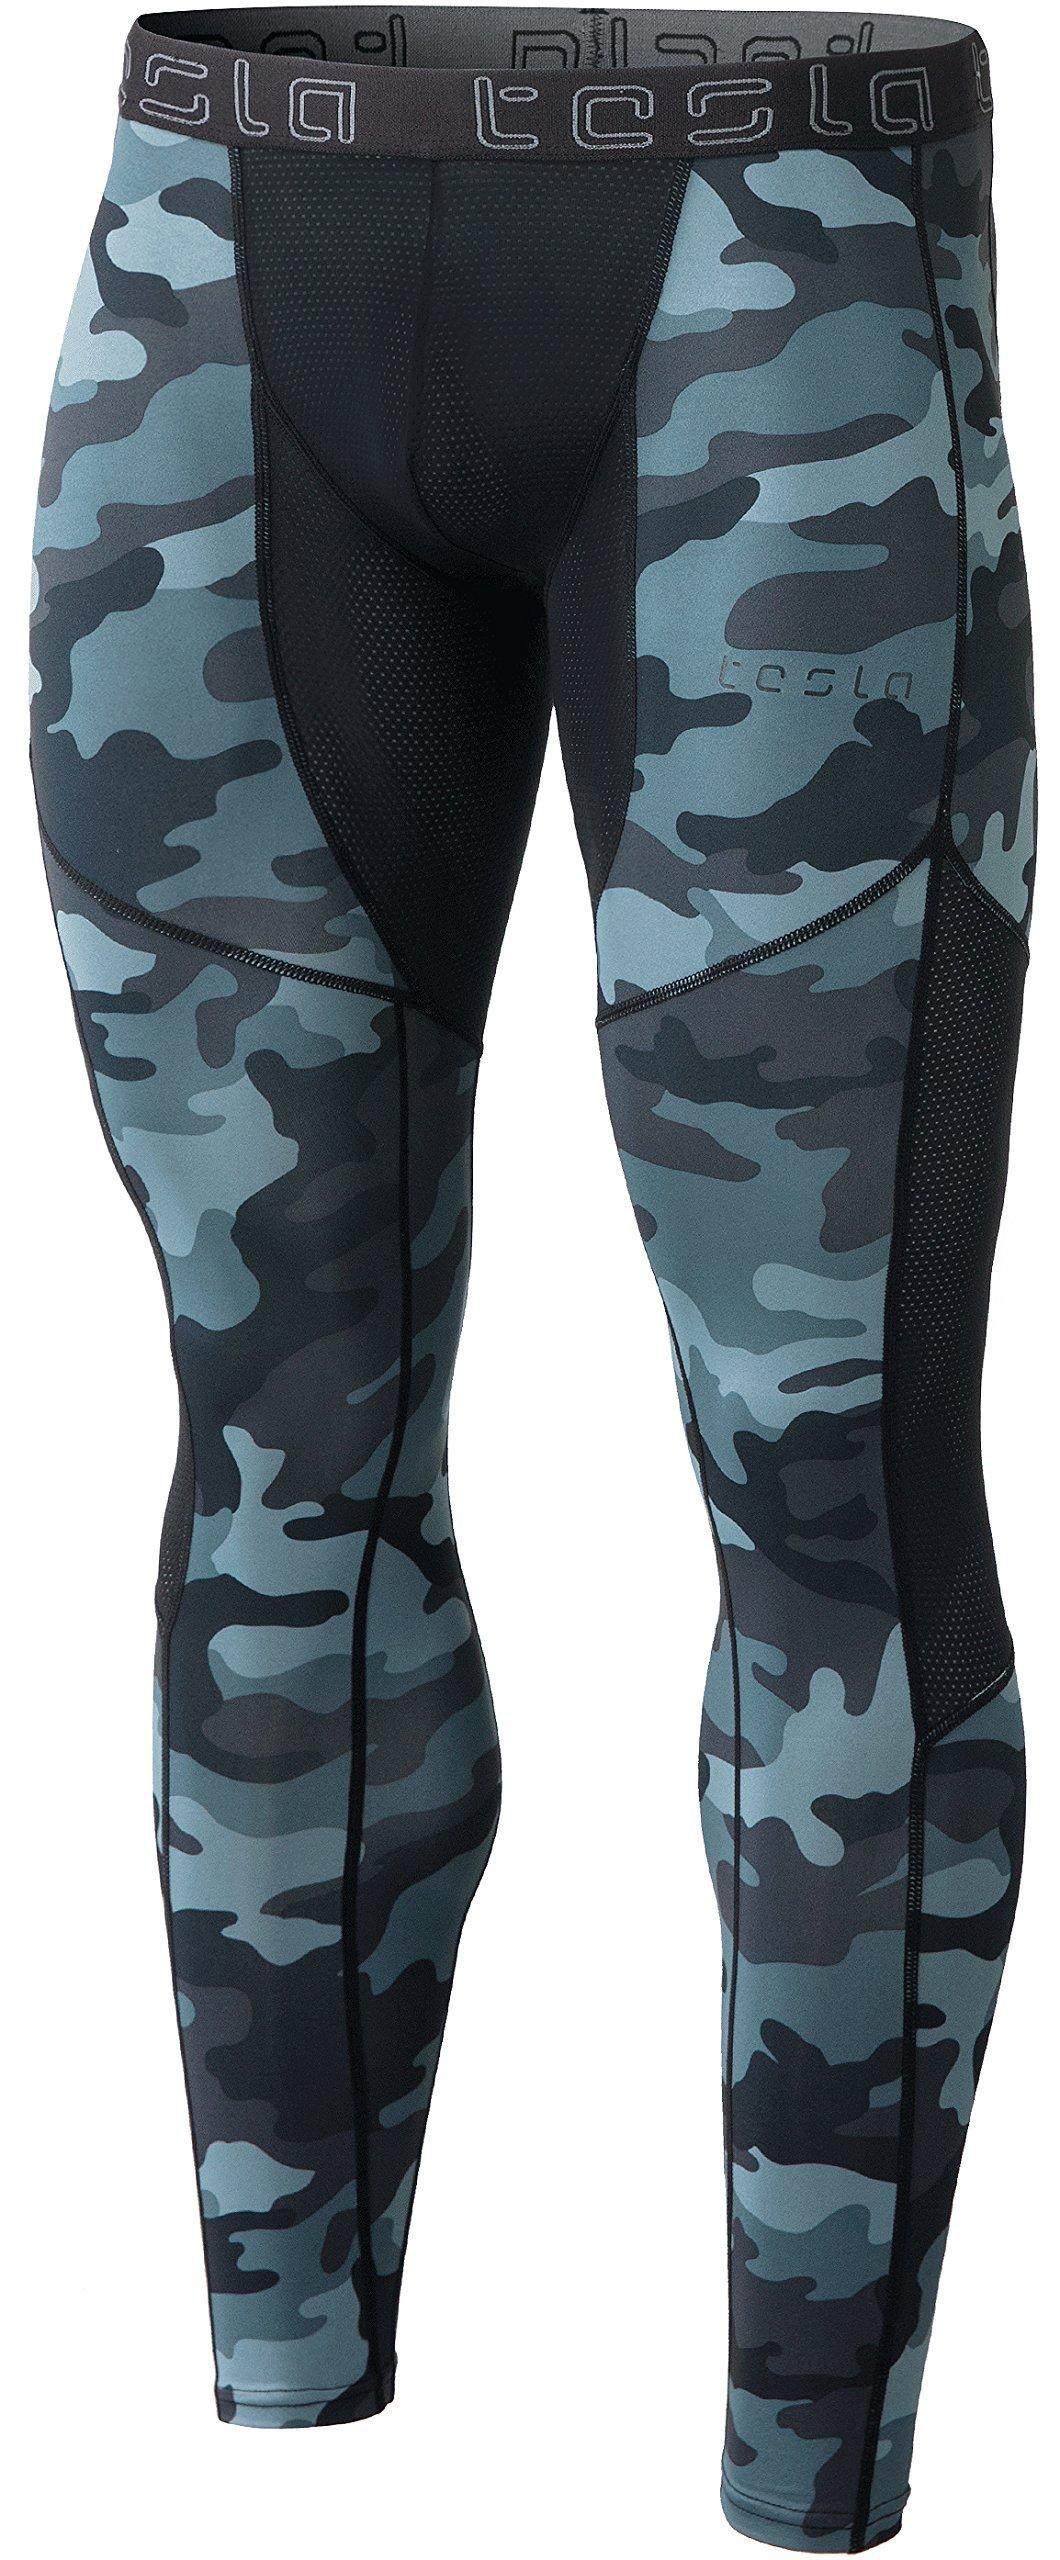 TSLA Men's Compression Pants Running Baselayer Cool Dry Sports Tights, Mesh(mup79) - Camo Dark Grey, Small by TSLA